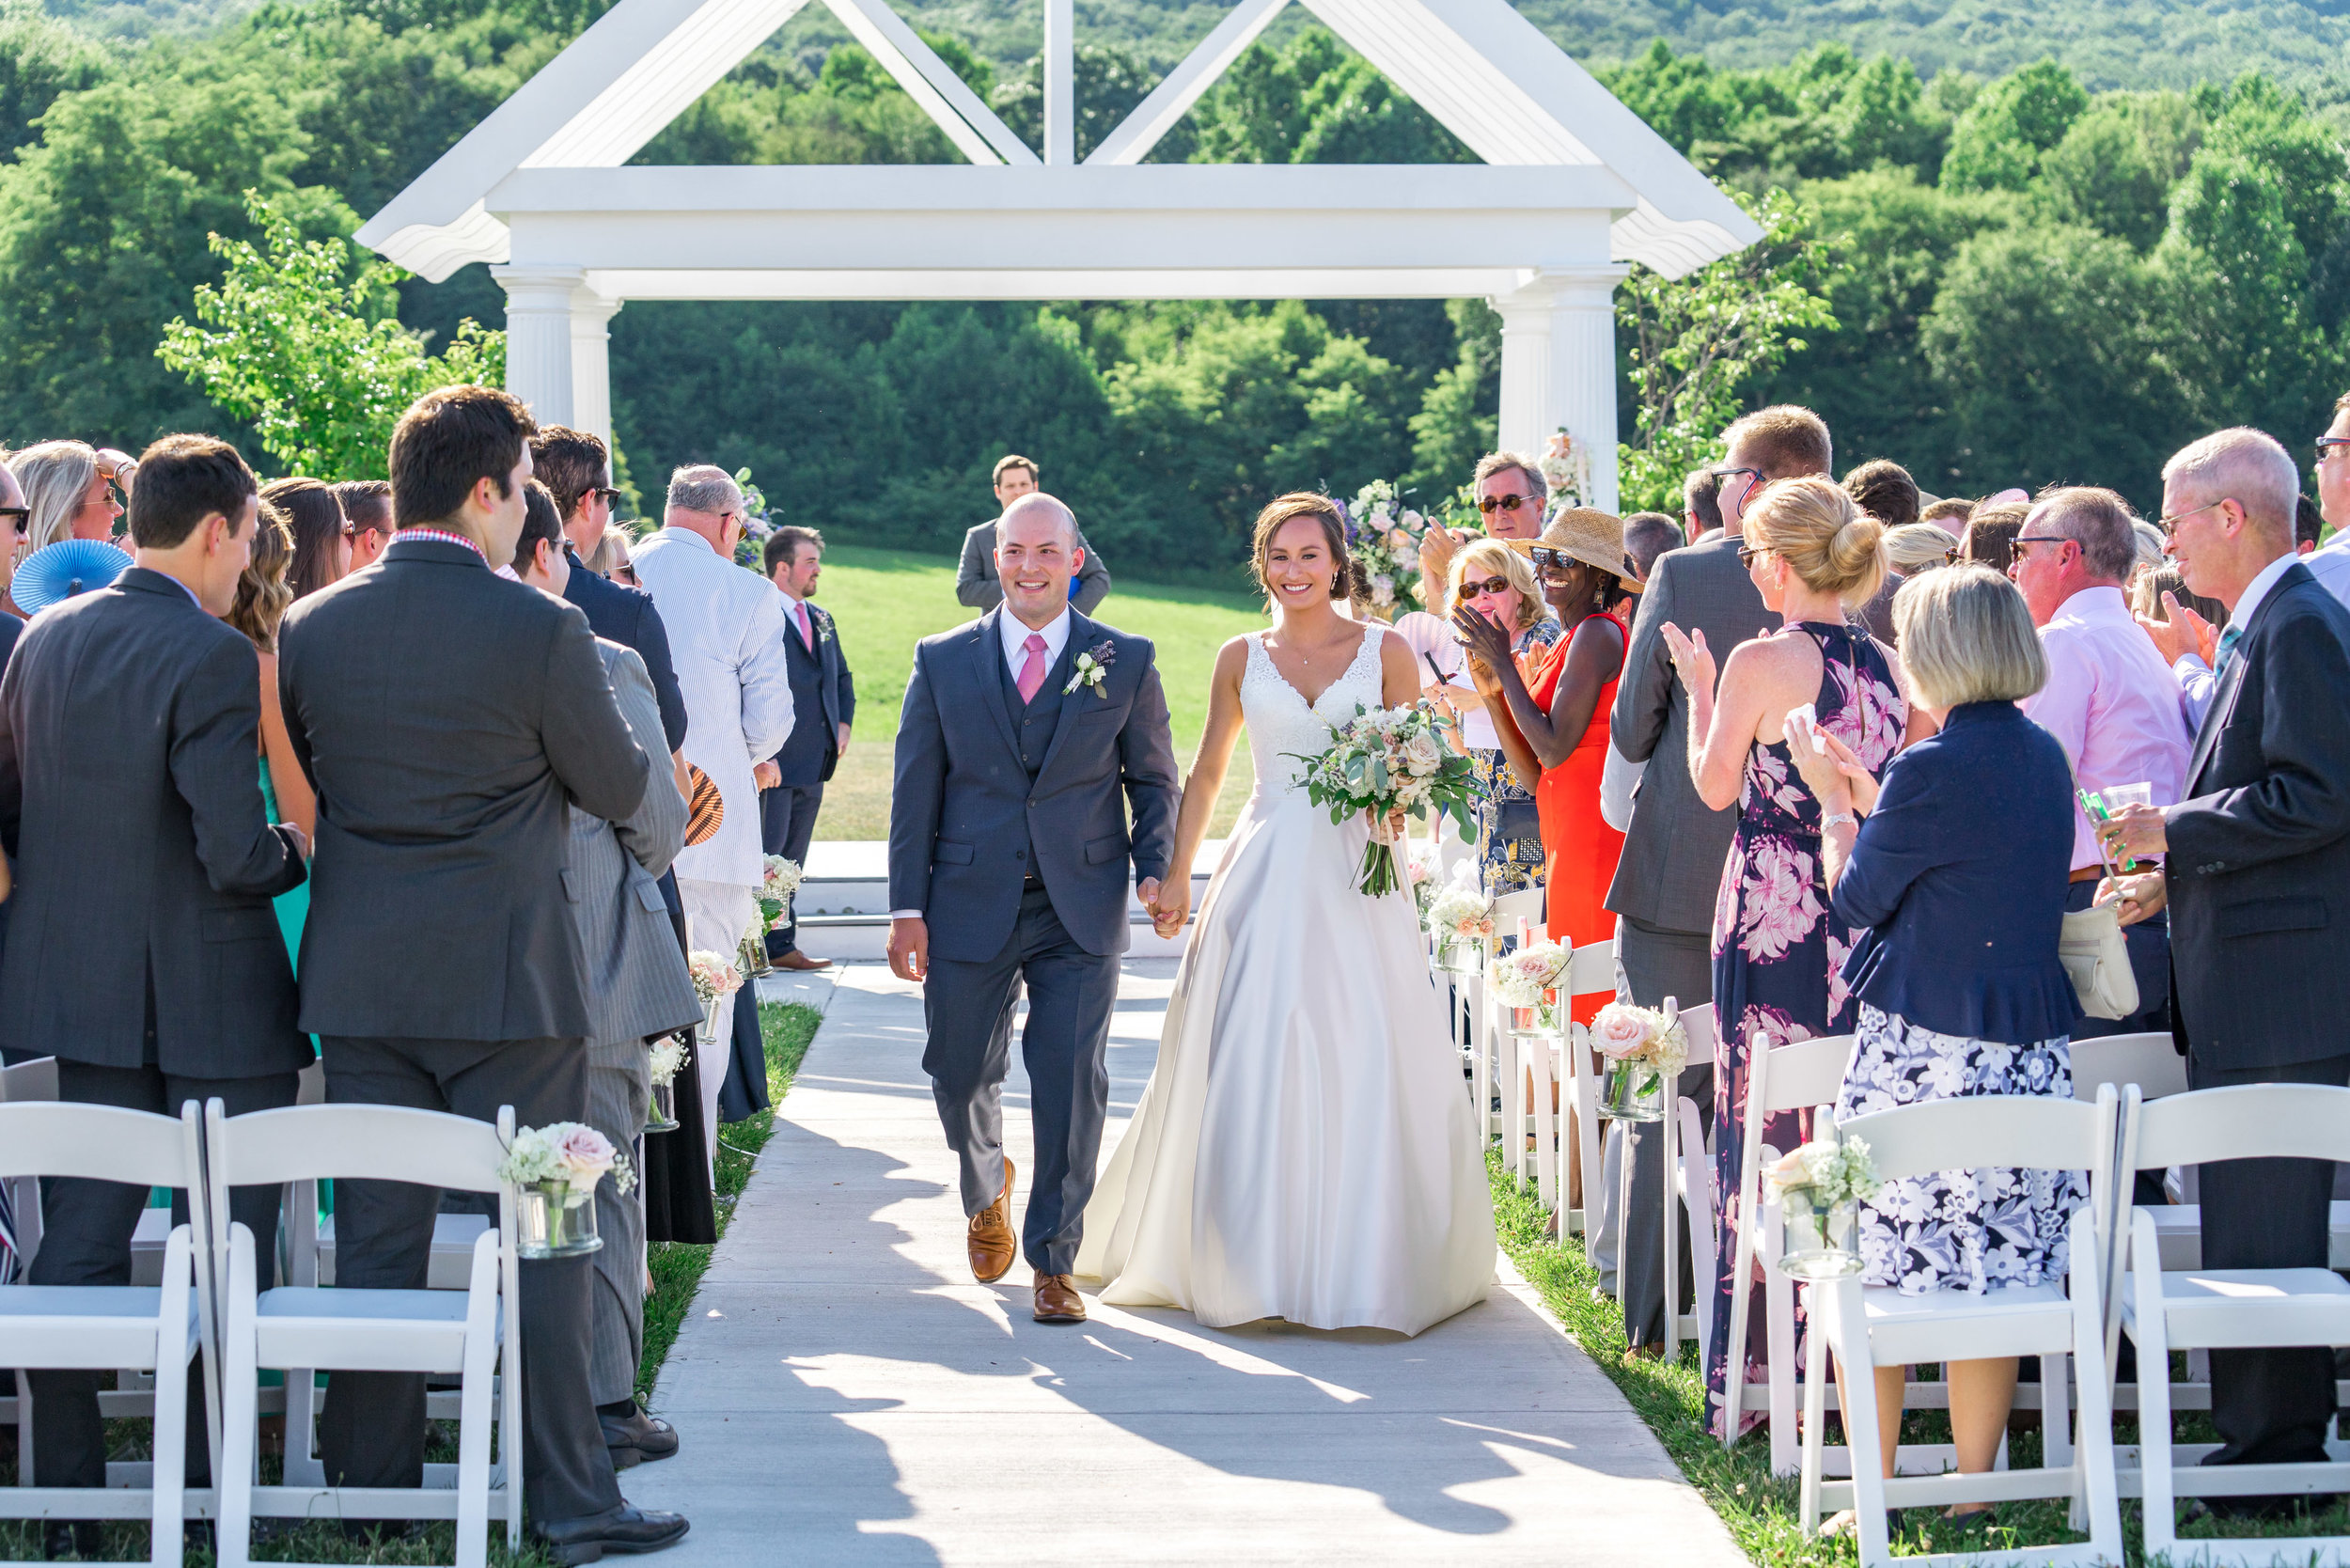 Springfield Manor Winery ceremony with bride and groom by jessica nazarova